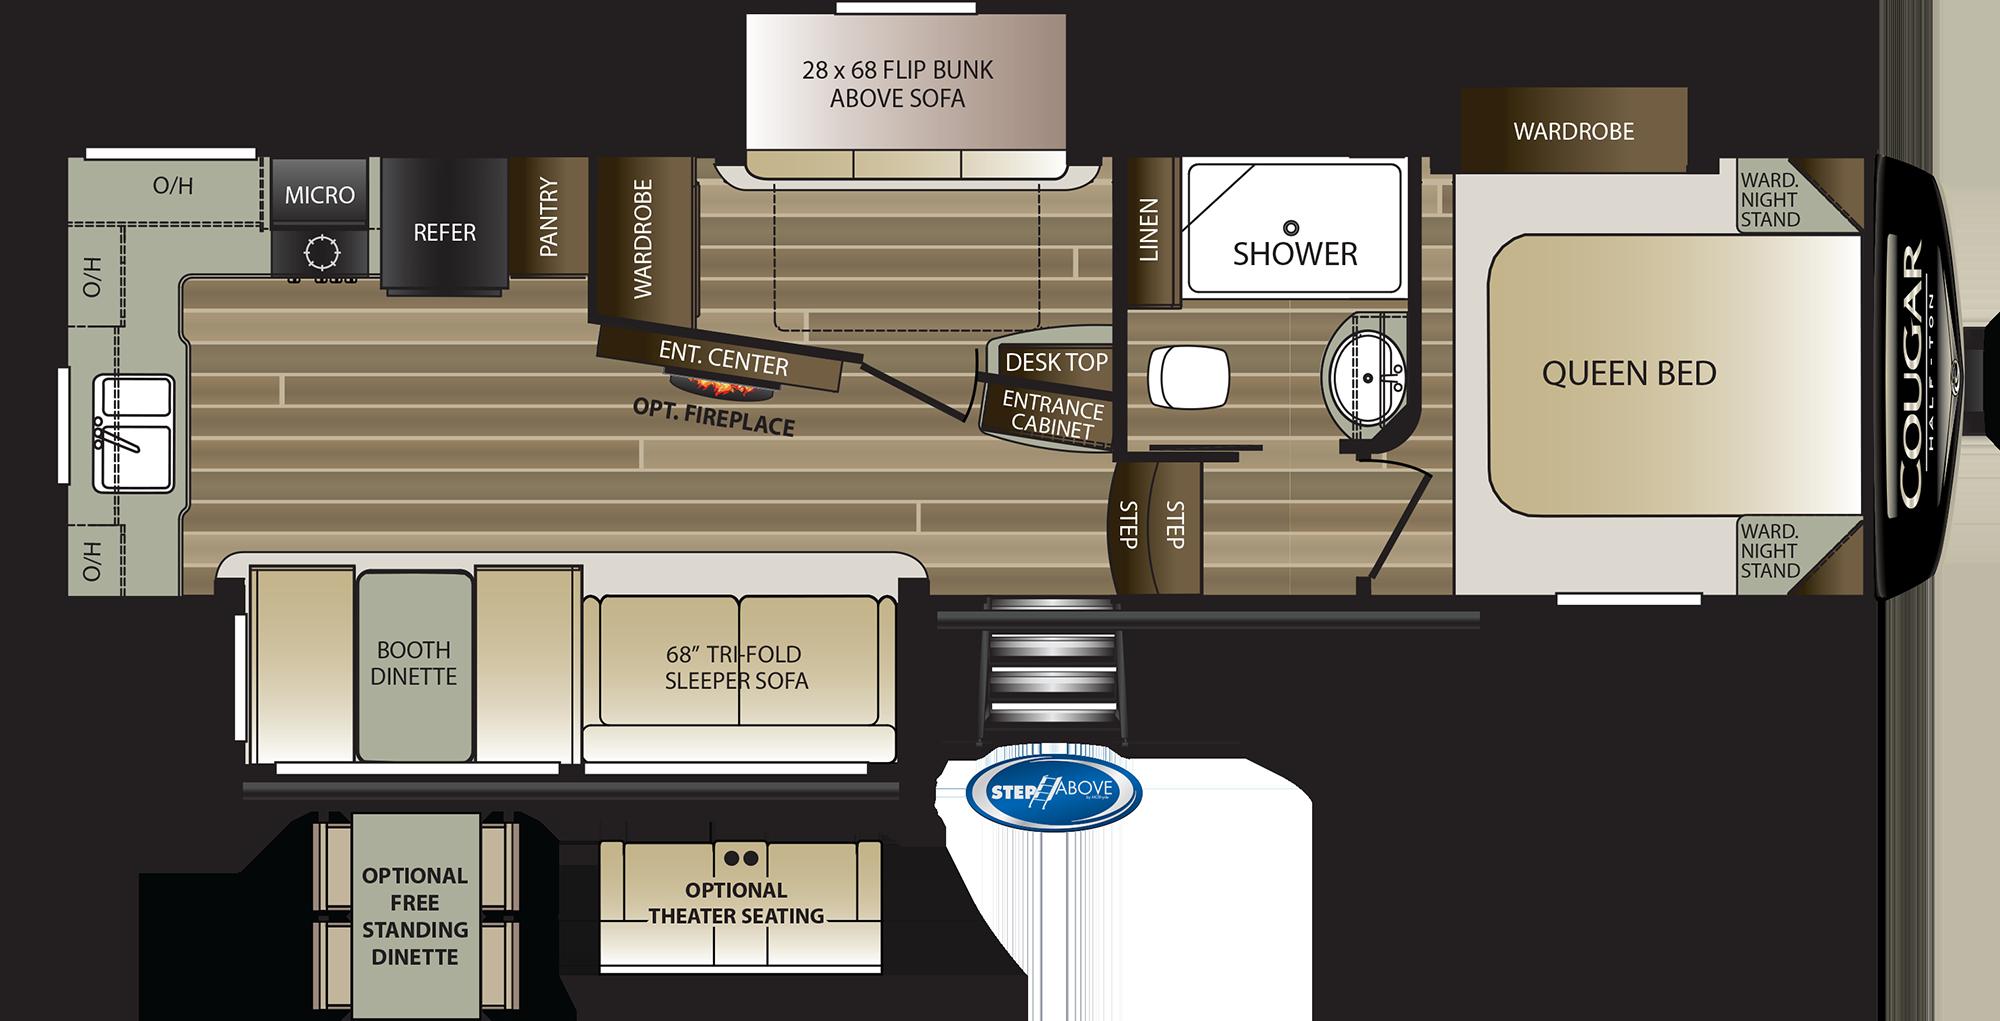 2020 KEYSTONE COUGAR HALF-TON 29MBS (bunks) Floorplan